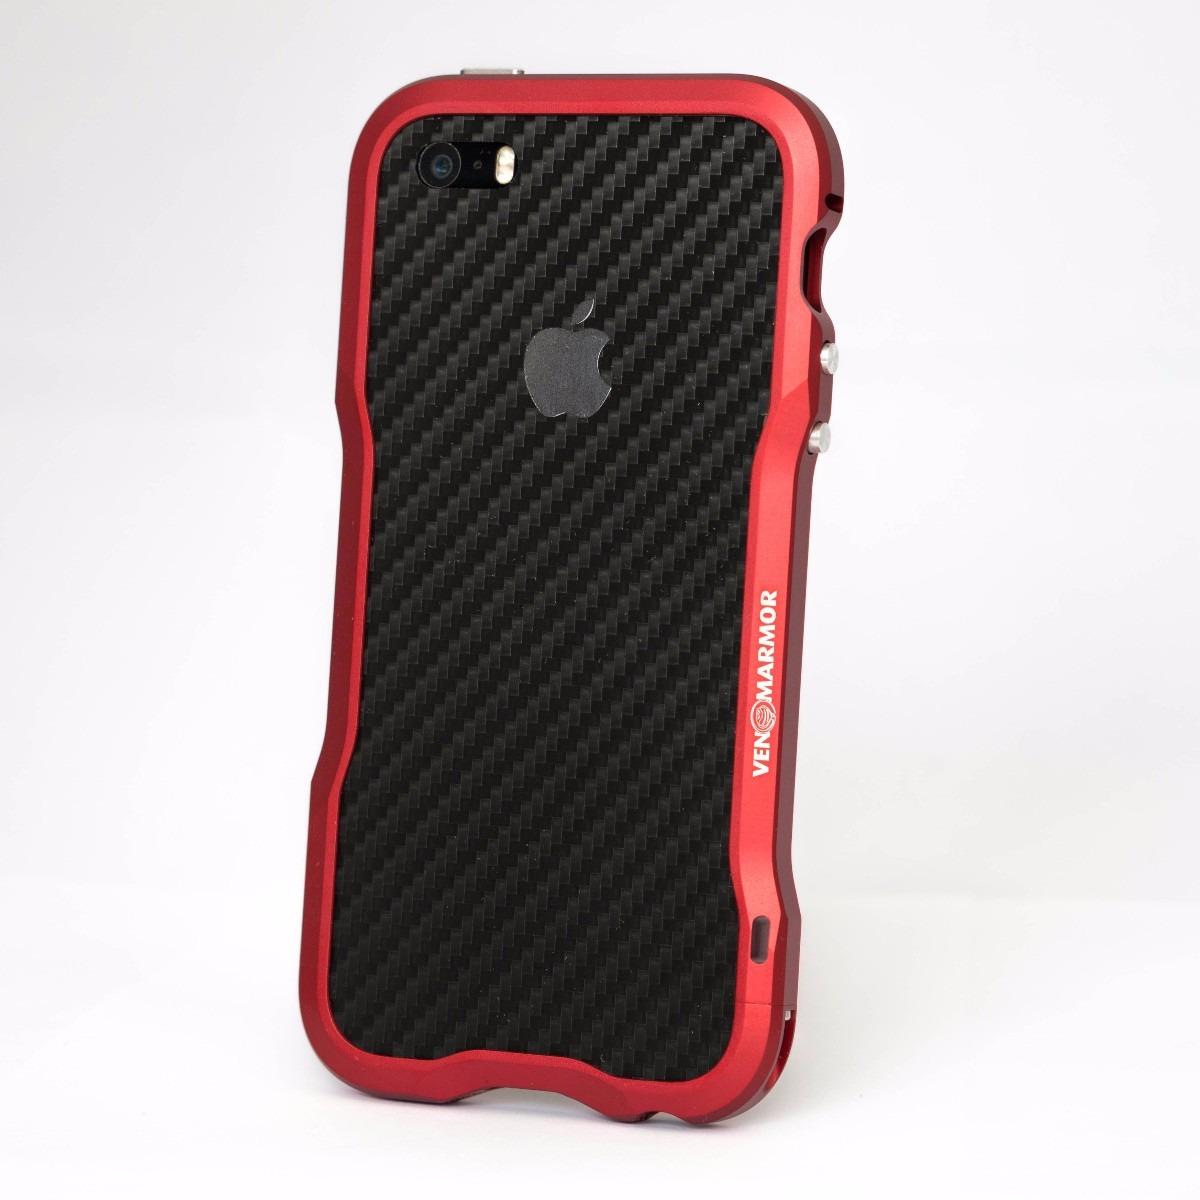 56903bf443a bumper case de aluminio venom armor - apple iphone 5 5s se. Cargando zoom.